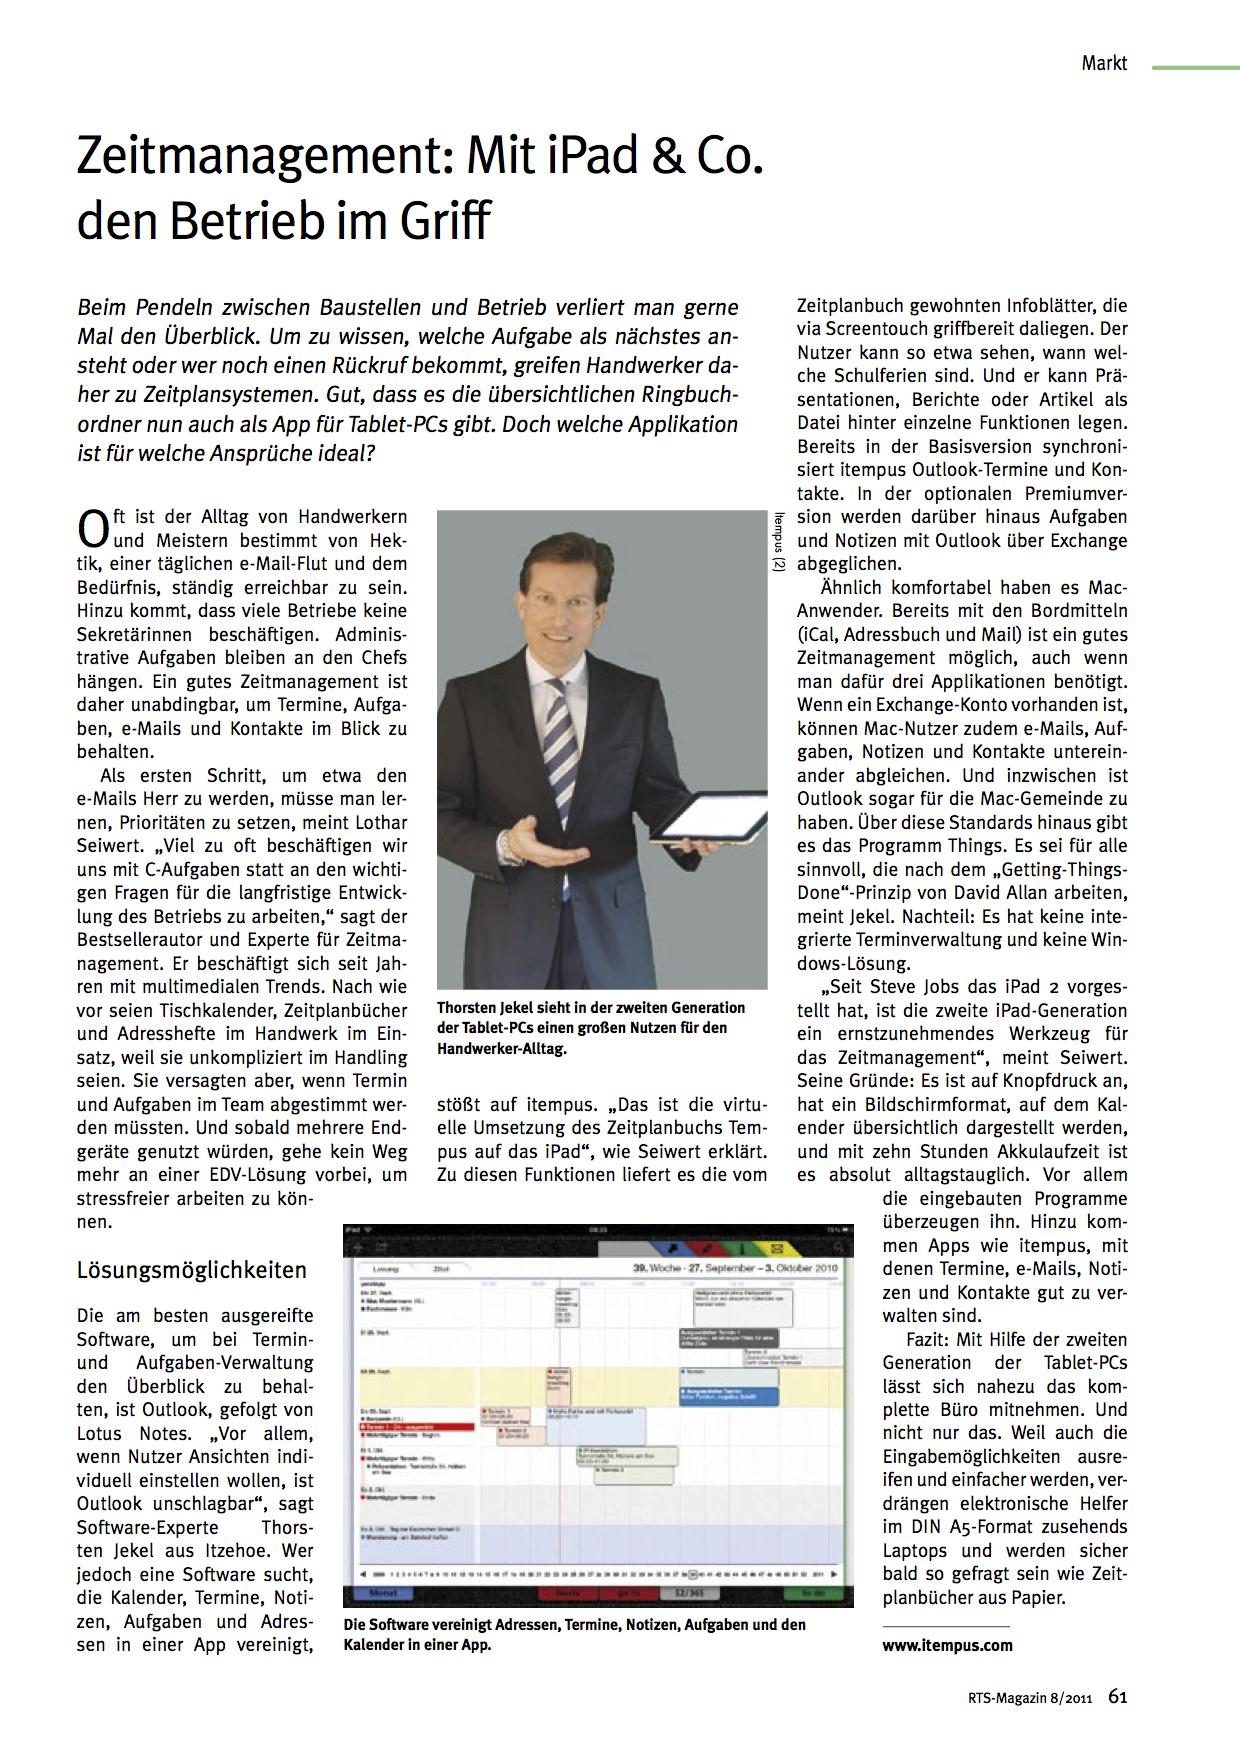 RTS Magazin